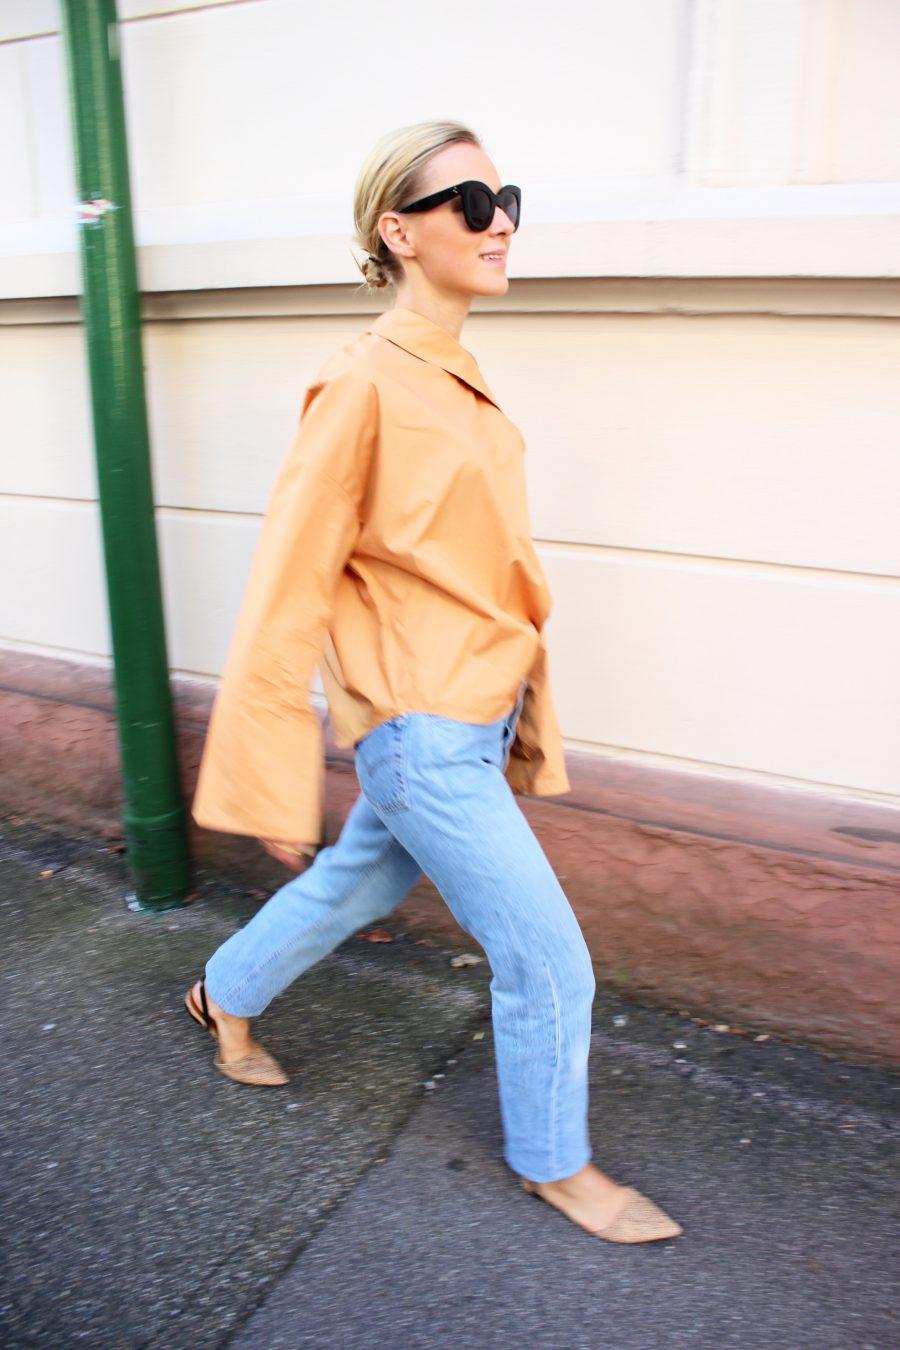 Zara Join Life peach top